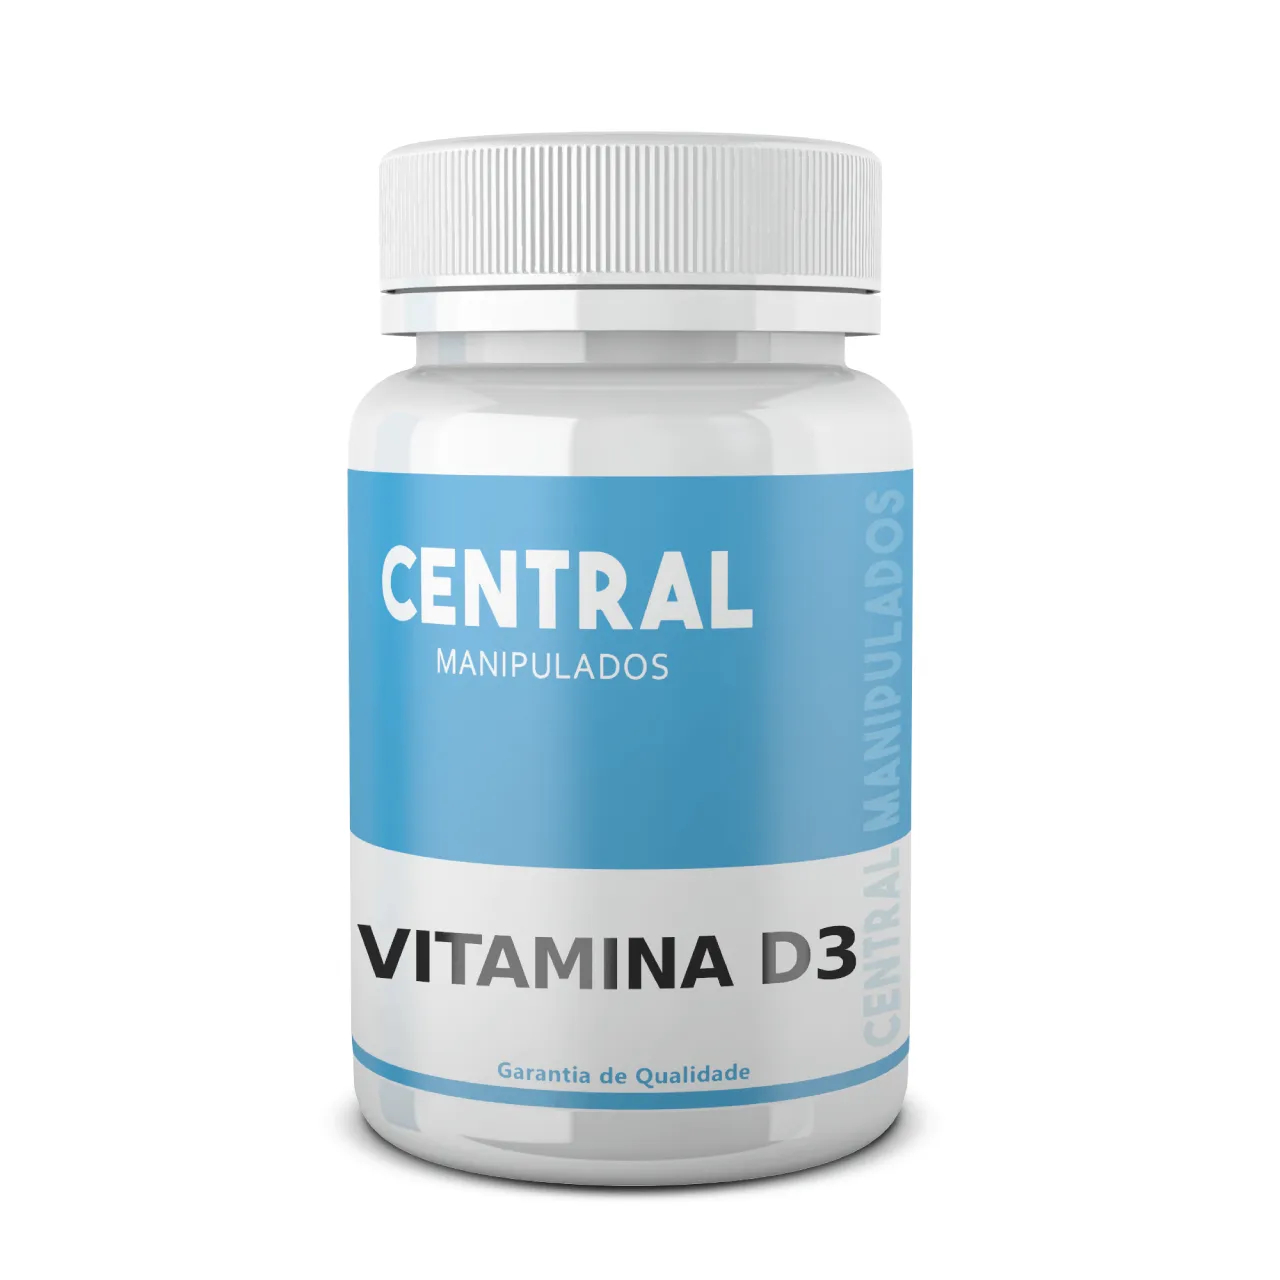 Vitamina D3 50.000 UI - 60 cápsulas - Saúde Óssea e Muscular